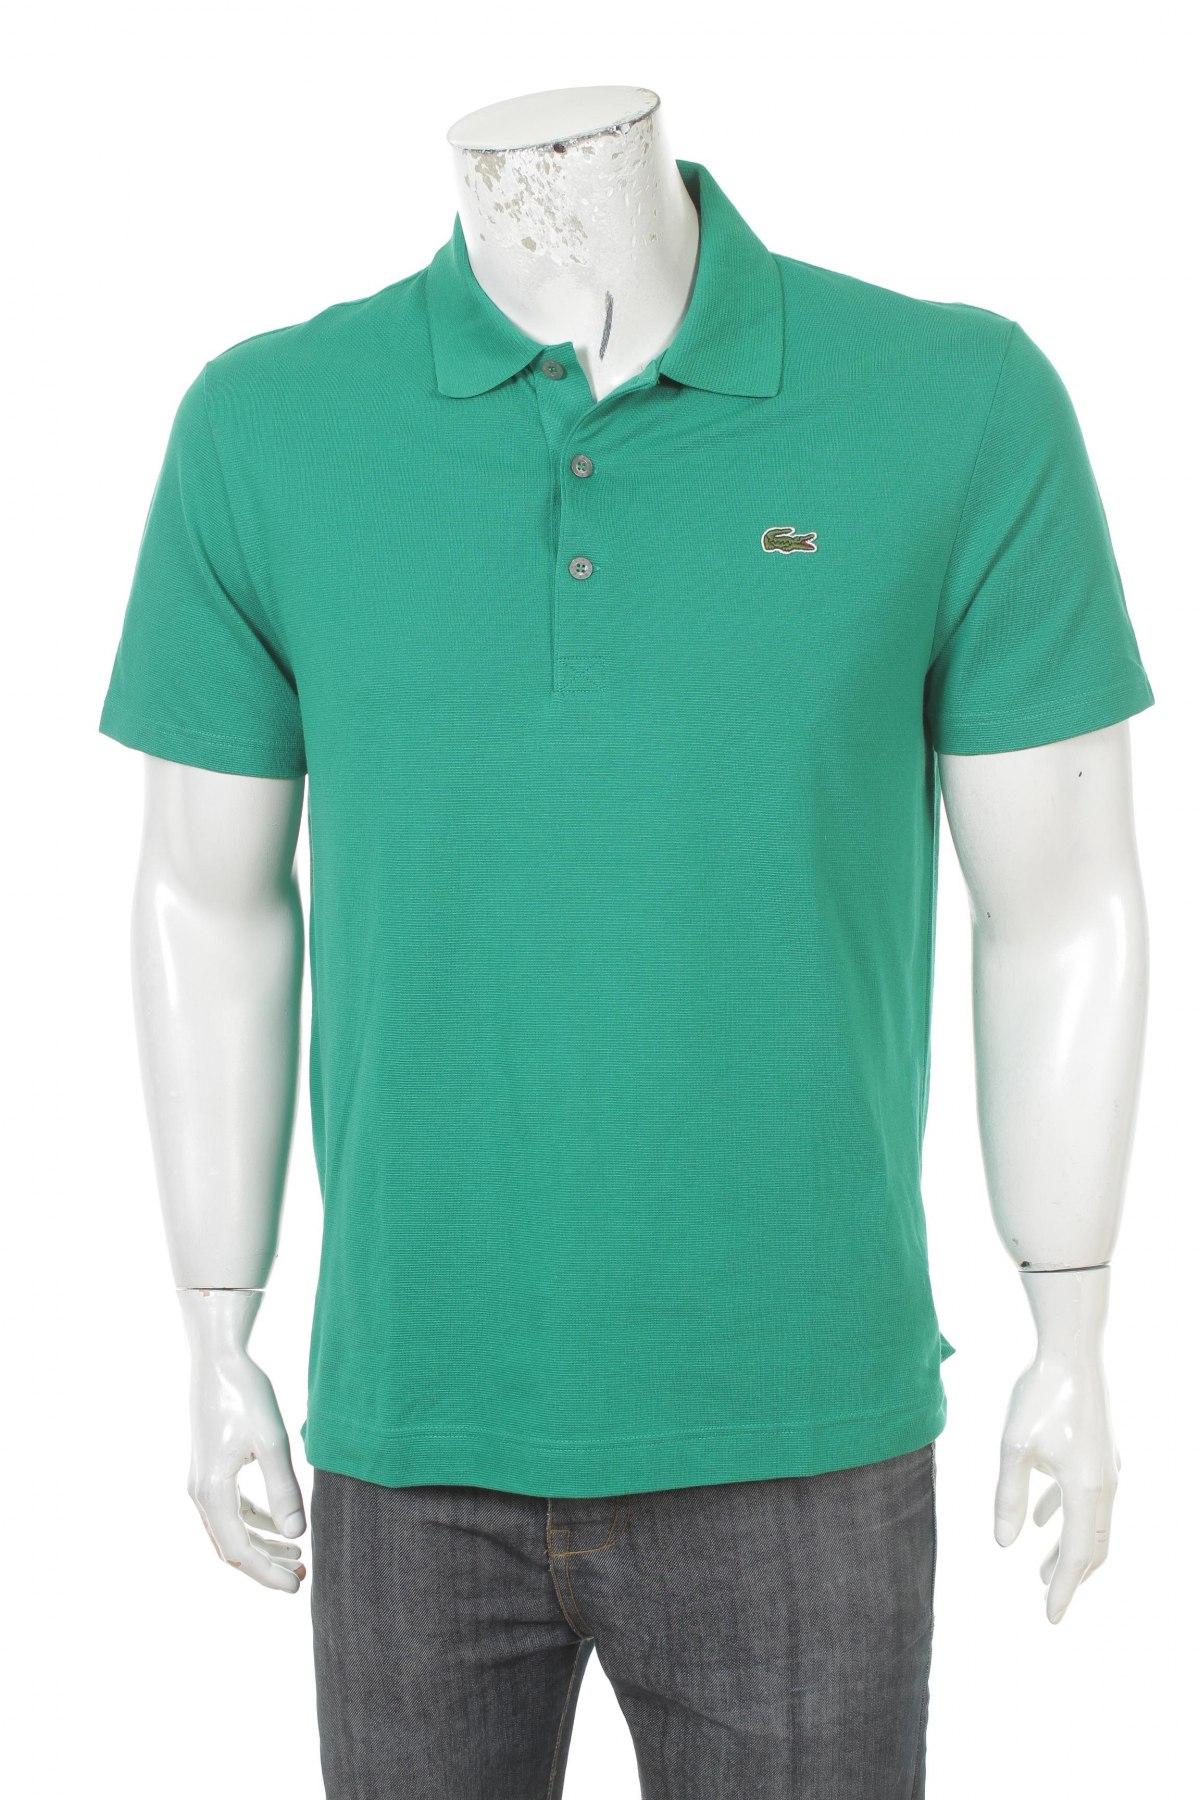 f94d3104661a Ανδρικό t-shirt Lacoste - σε συμφέρουσα τιμή στο Remix -  100200518